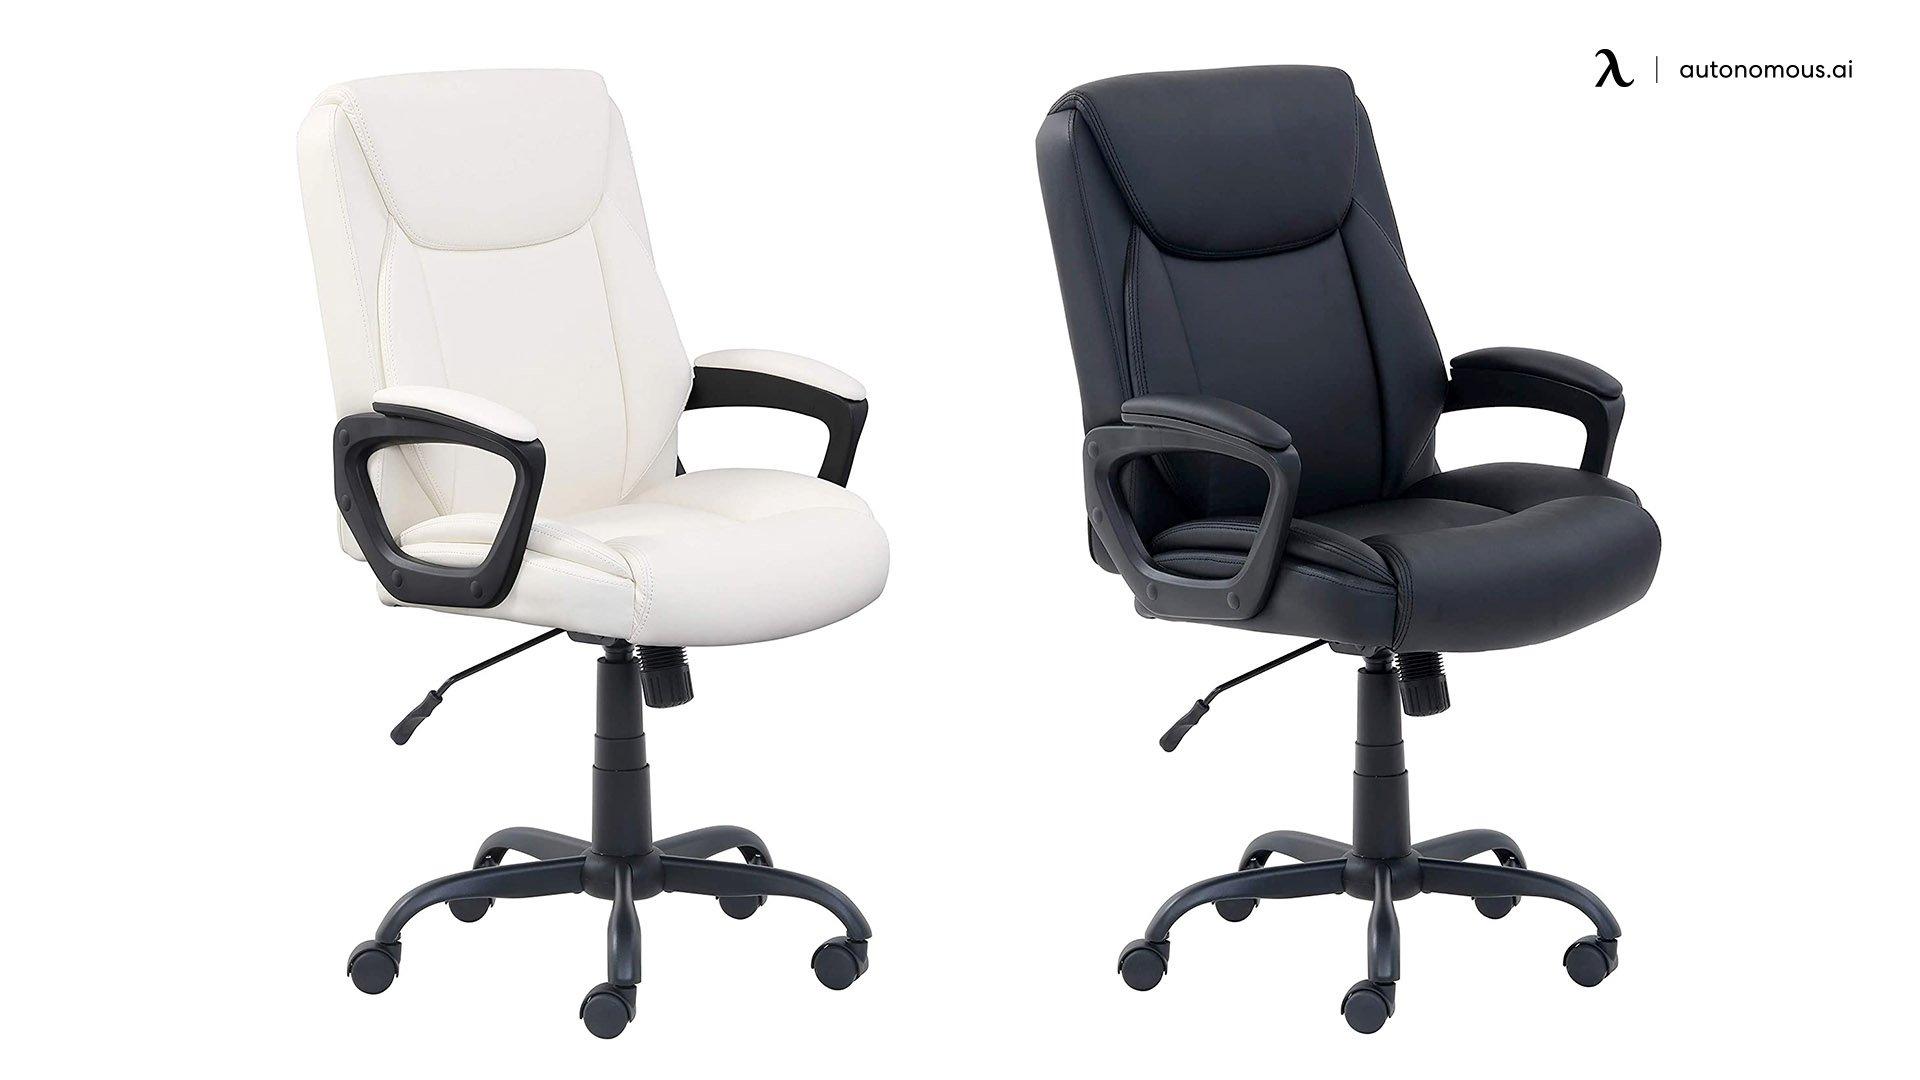 AmazonBasics Ergonomic High Back Reclining Mesh Office Chair